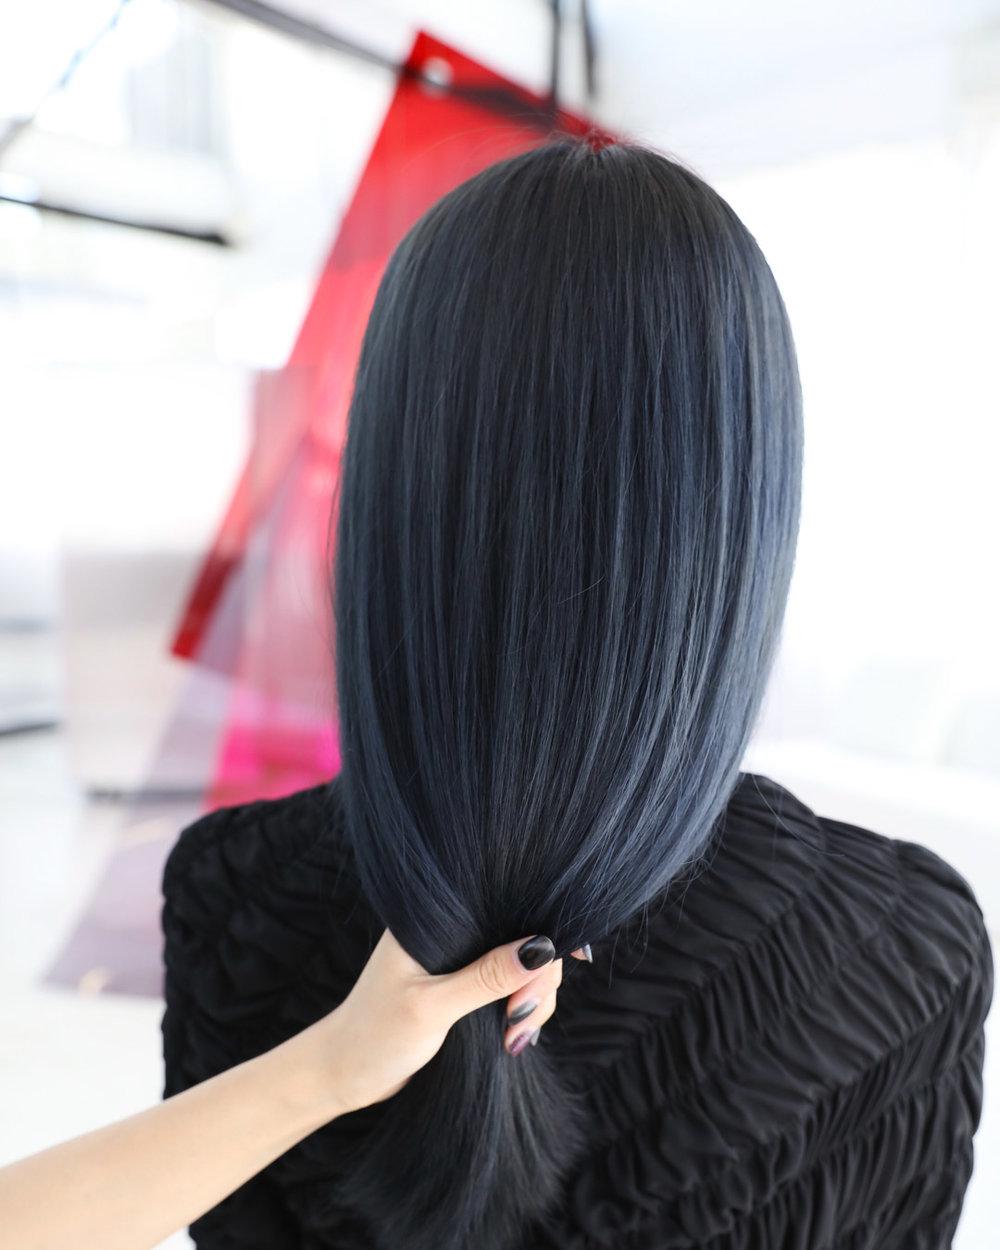 moonstone blue - Whole-head bleach, Colour, CutPRICEapprox. $640 (Whole-head bleach long $380, Colour $190, Cut from $70)TIMEapprox. 5 hour